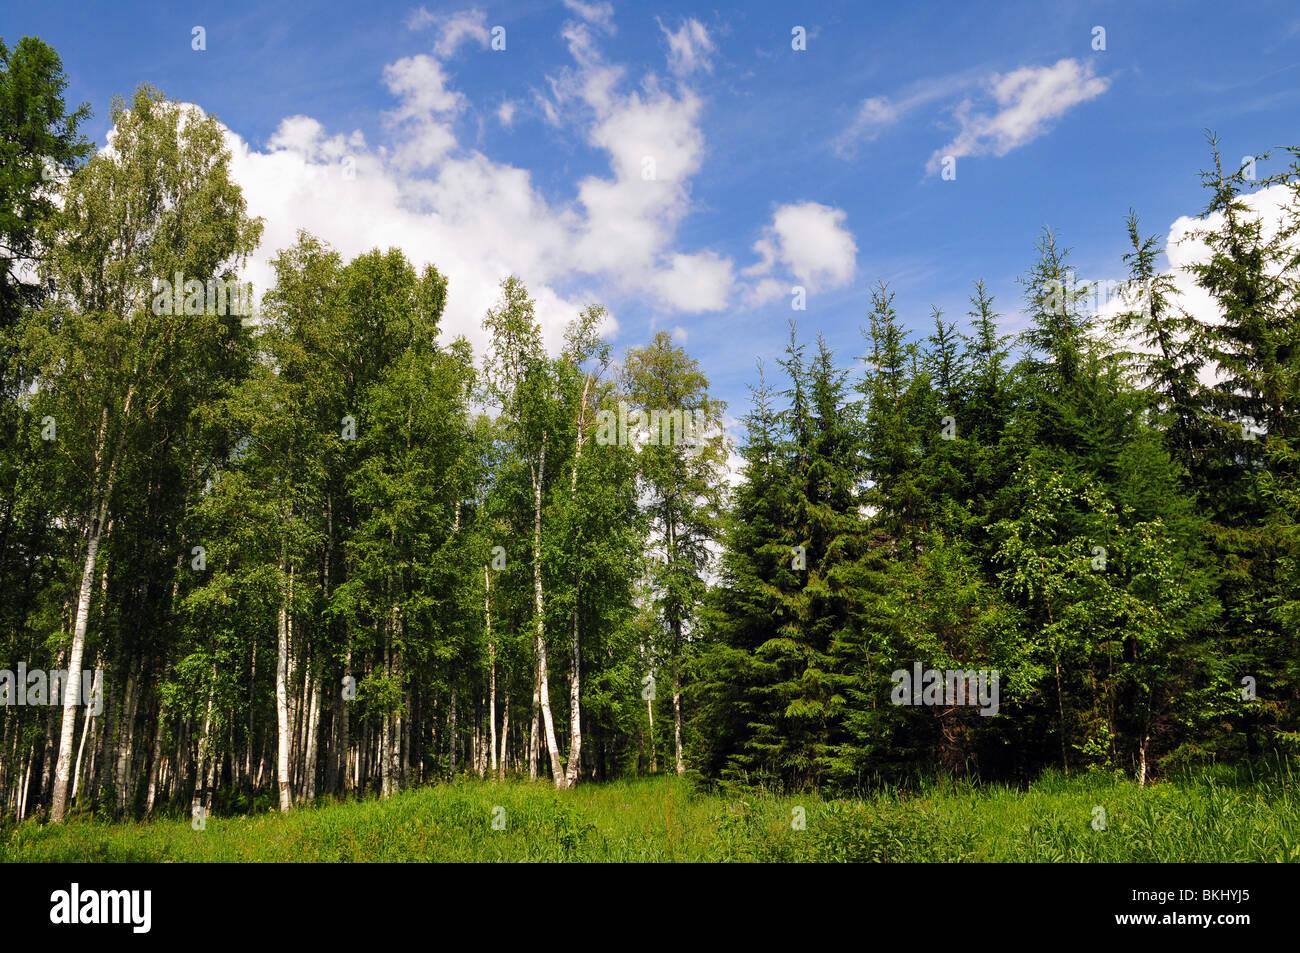 Sommerlandschaft des jungen grünen Wald mit strahlend blauem Himmel Stockbild